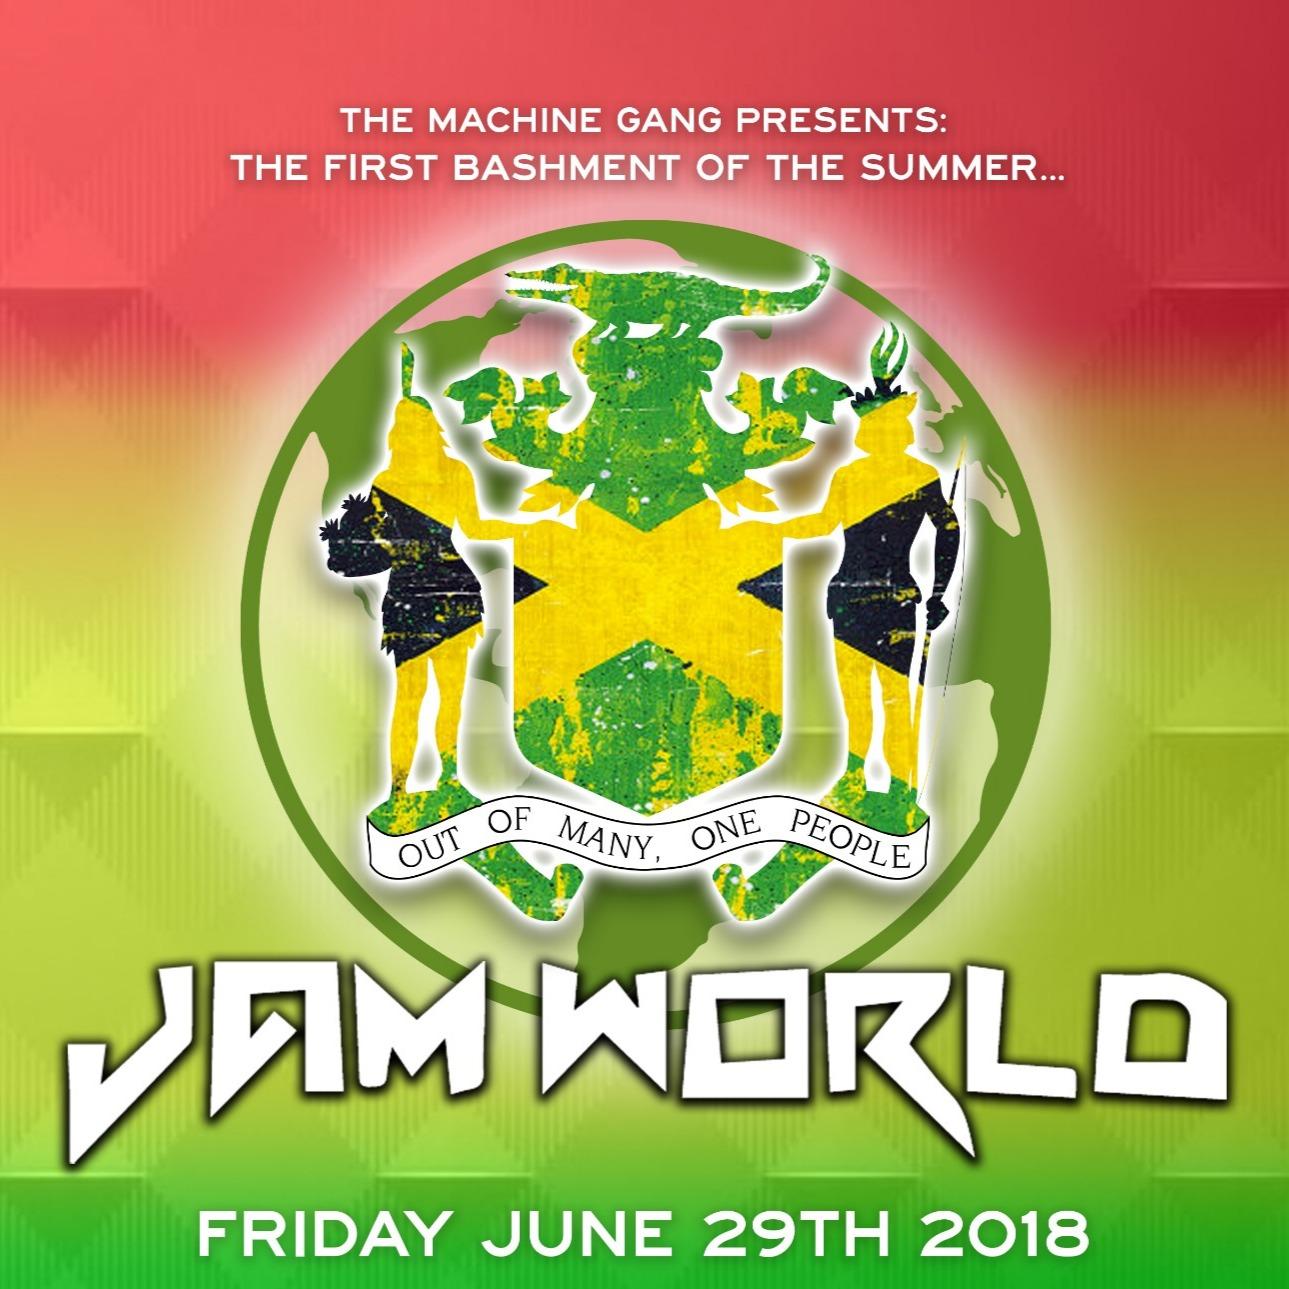 JAMWORLD - 100% REGGAE & DANCEHALL - First Bashment of the Summer!